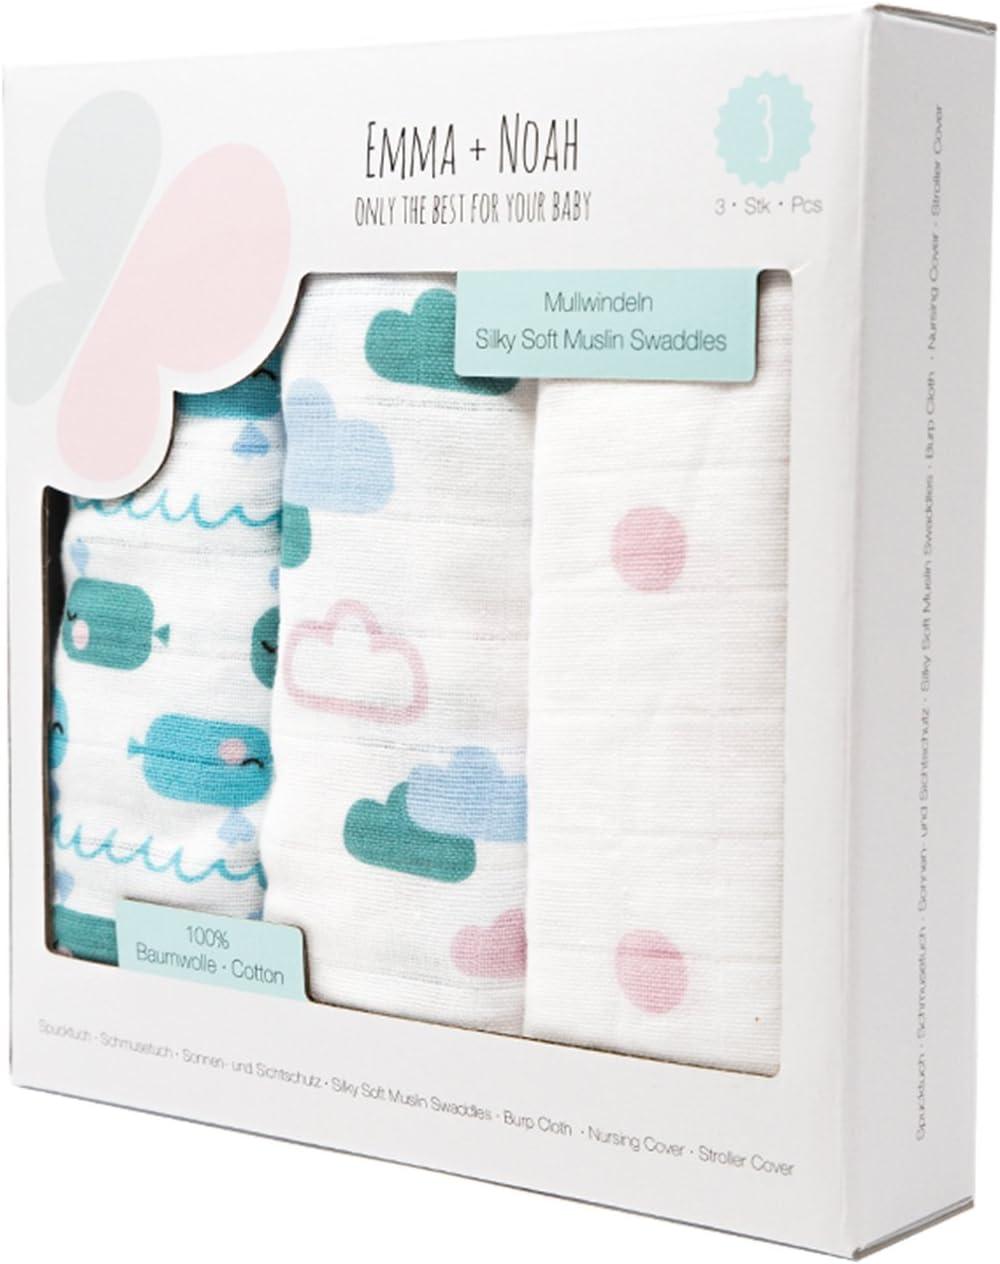 paquete de 3 doudou Muselinas para beb/és de emma /& noah 100/% algod/ón pa/ños de mulet/ón mantas de lactancia 80x80 cm pa/ños de muselina suaves para beb/é,ideal como pa/ñales de tela